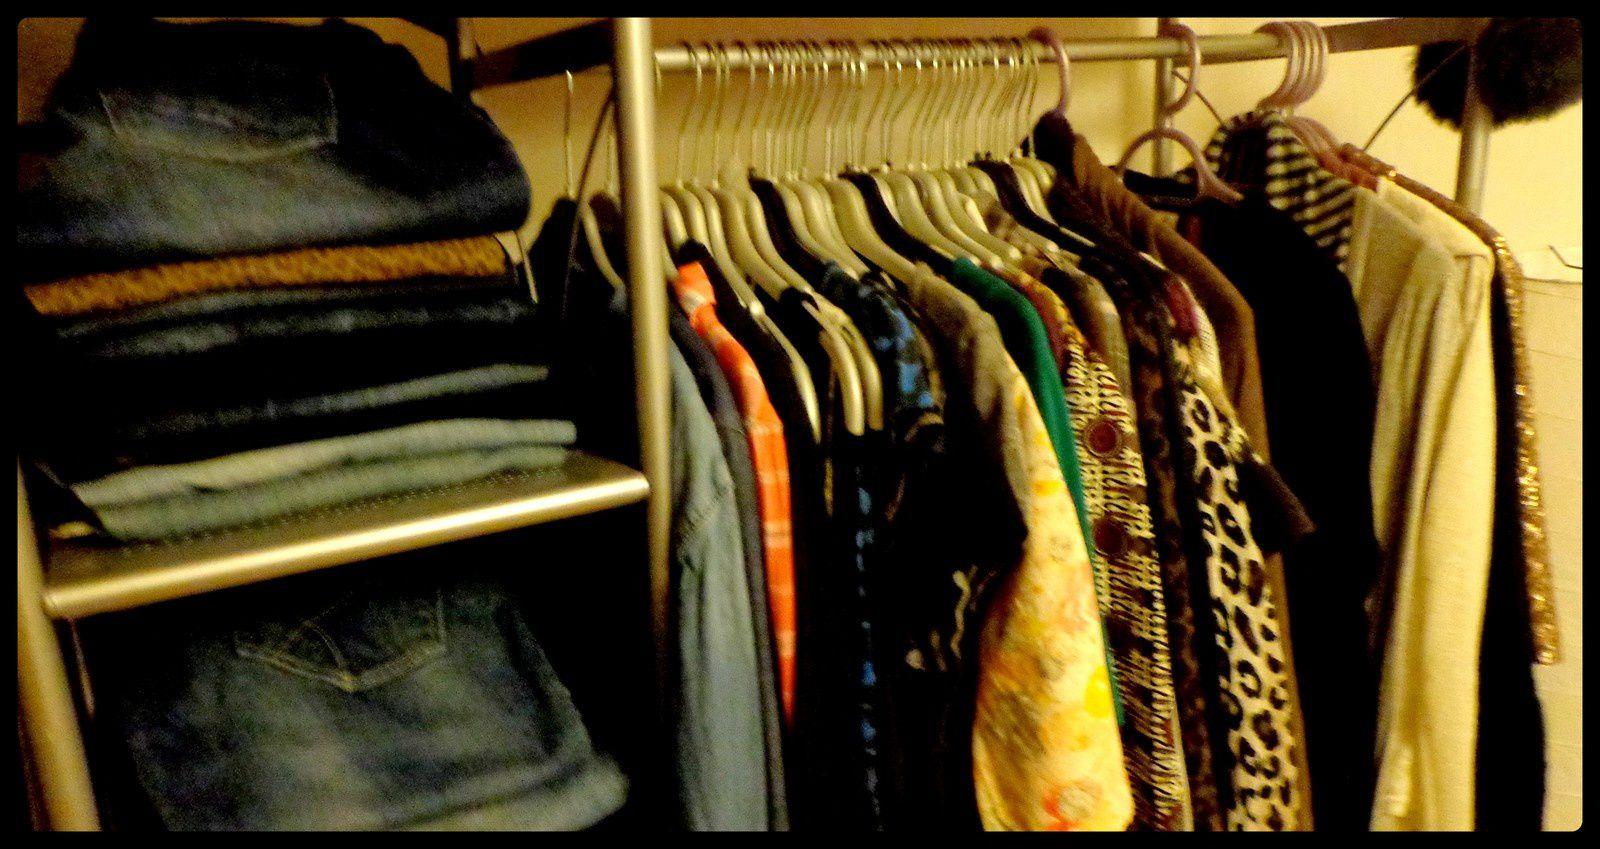 VIDE DRESSING & APÉRO #12 - Jeudi 26 Février 2015 - 19h00 / 22h00